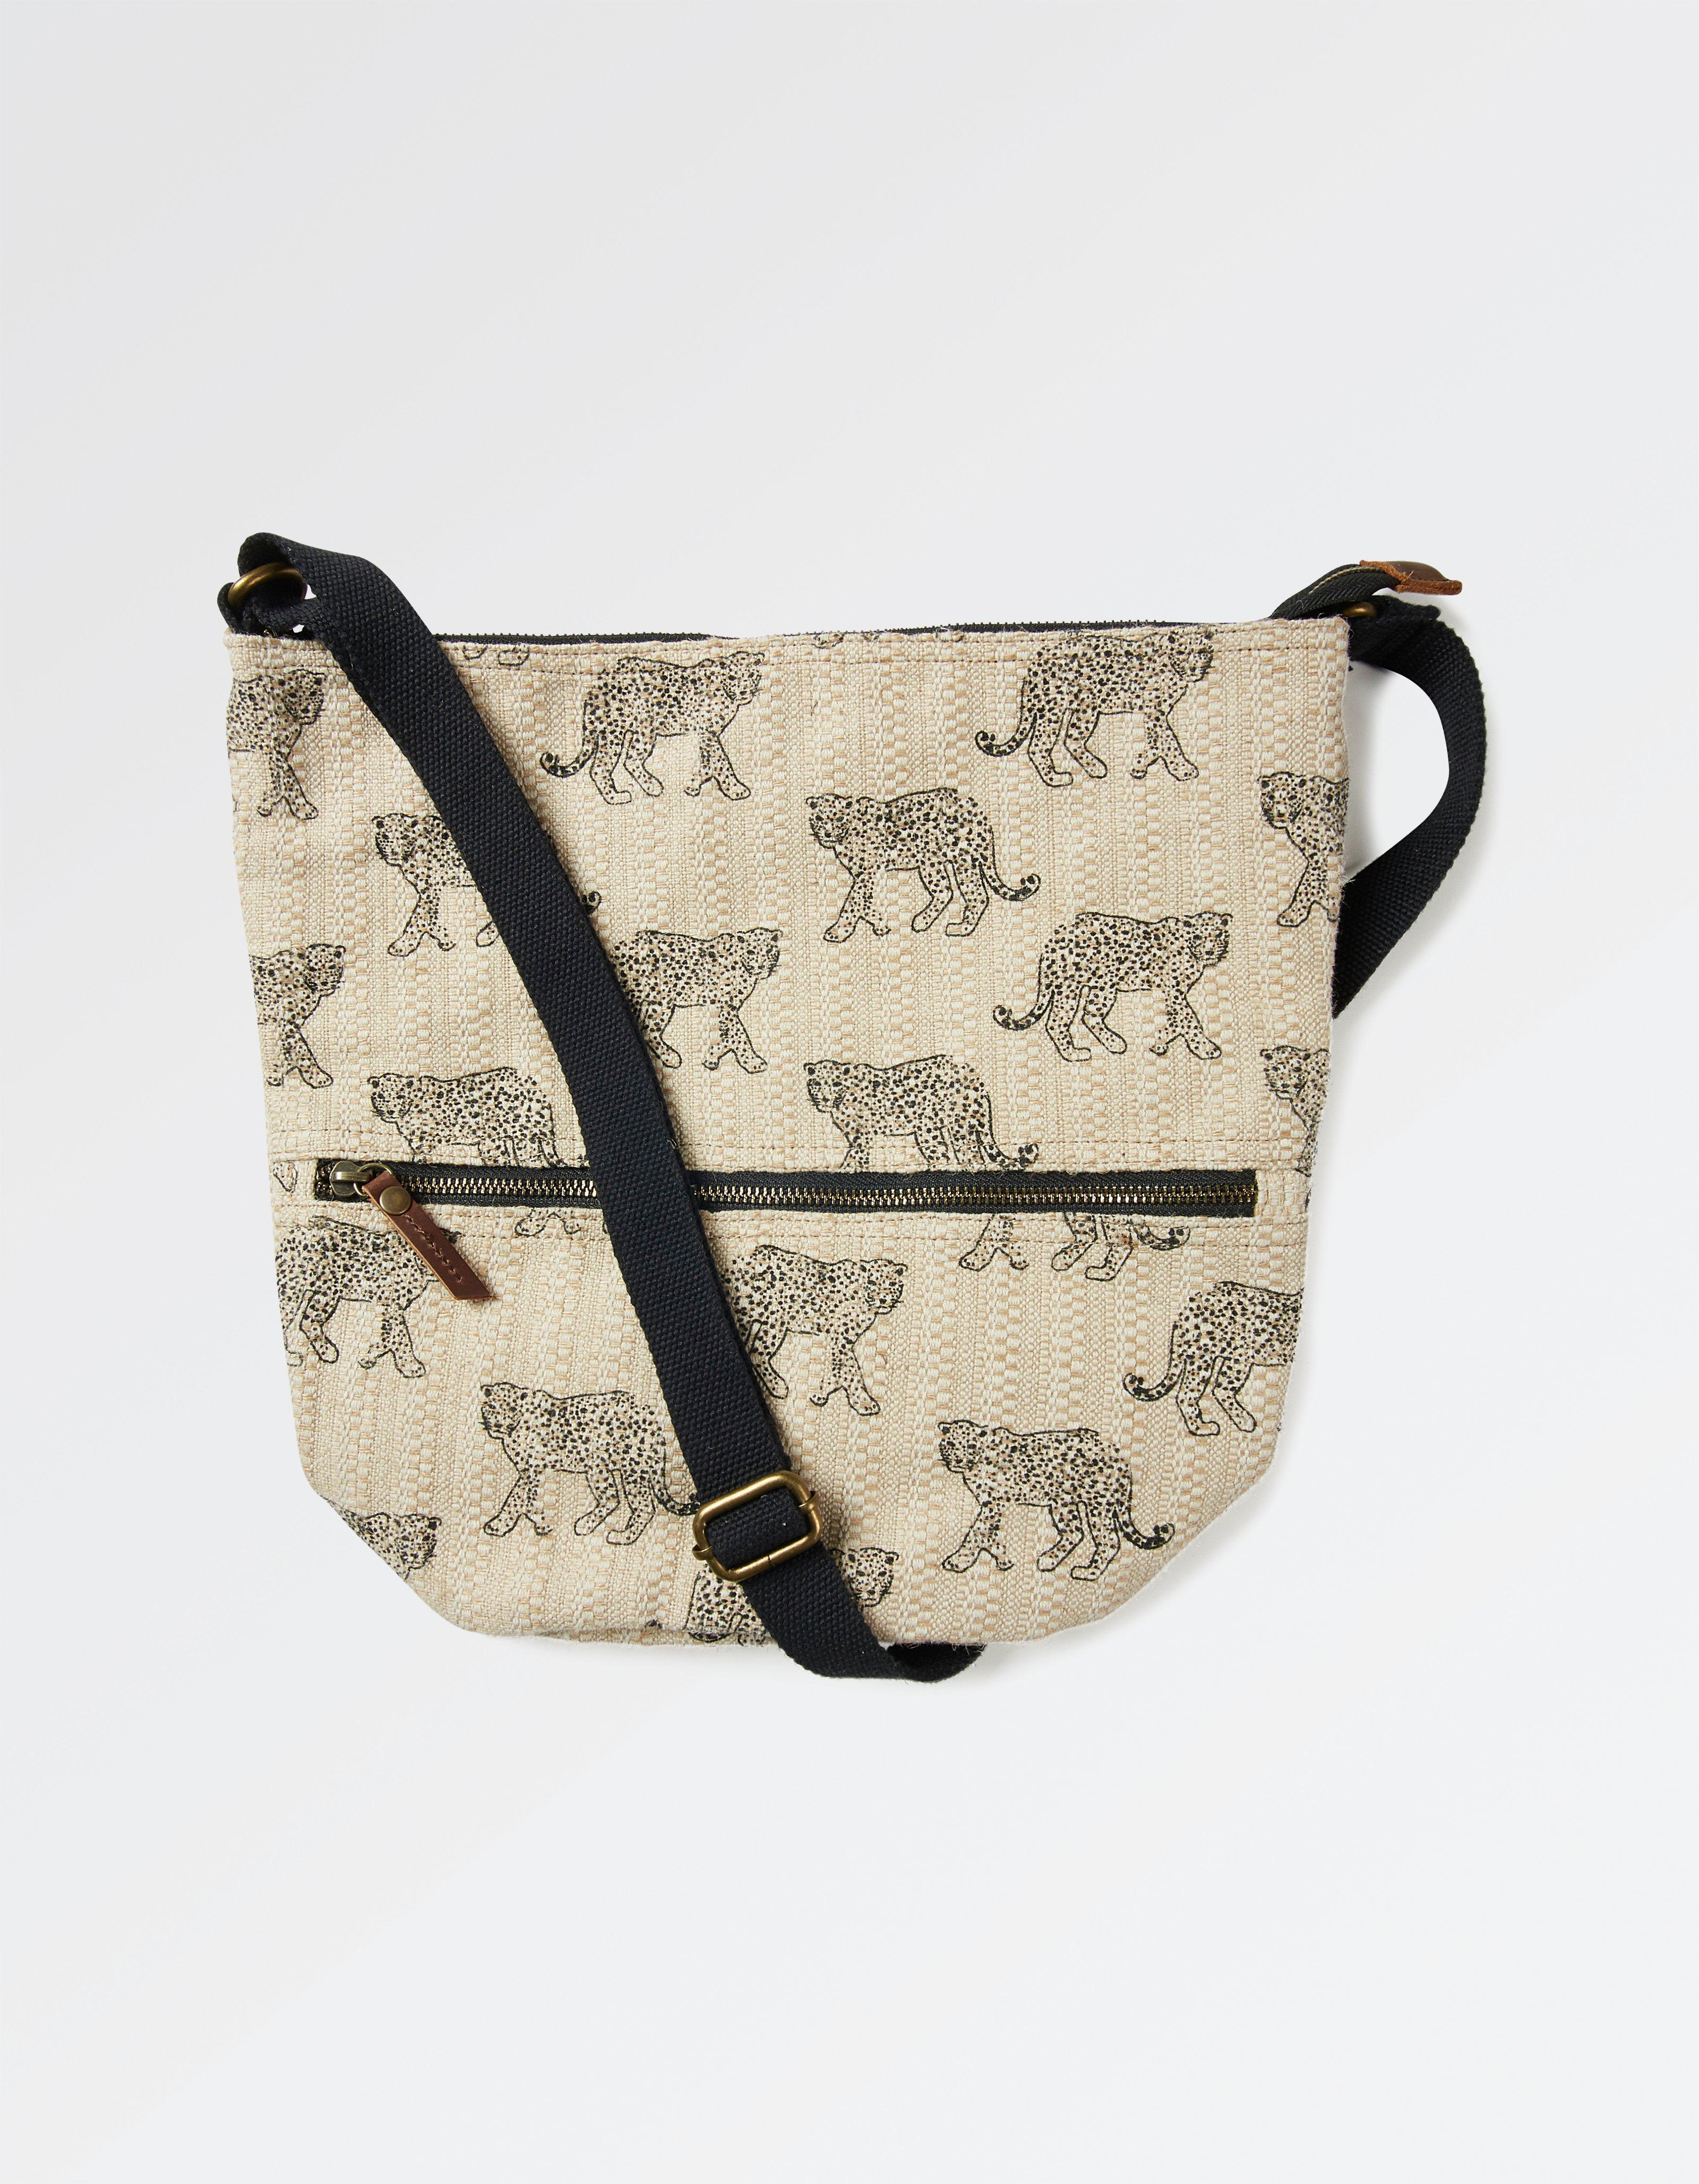 Big Cat Woven Tia Cross Body Bag